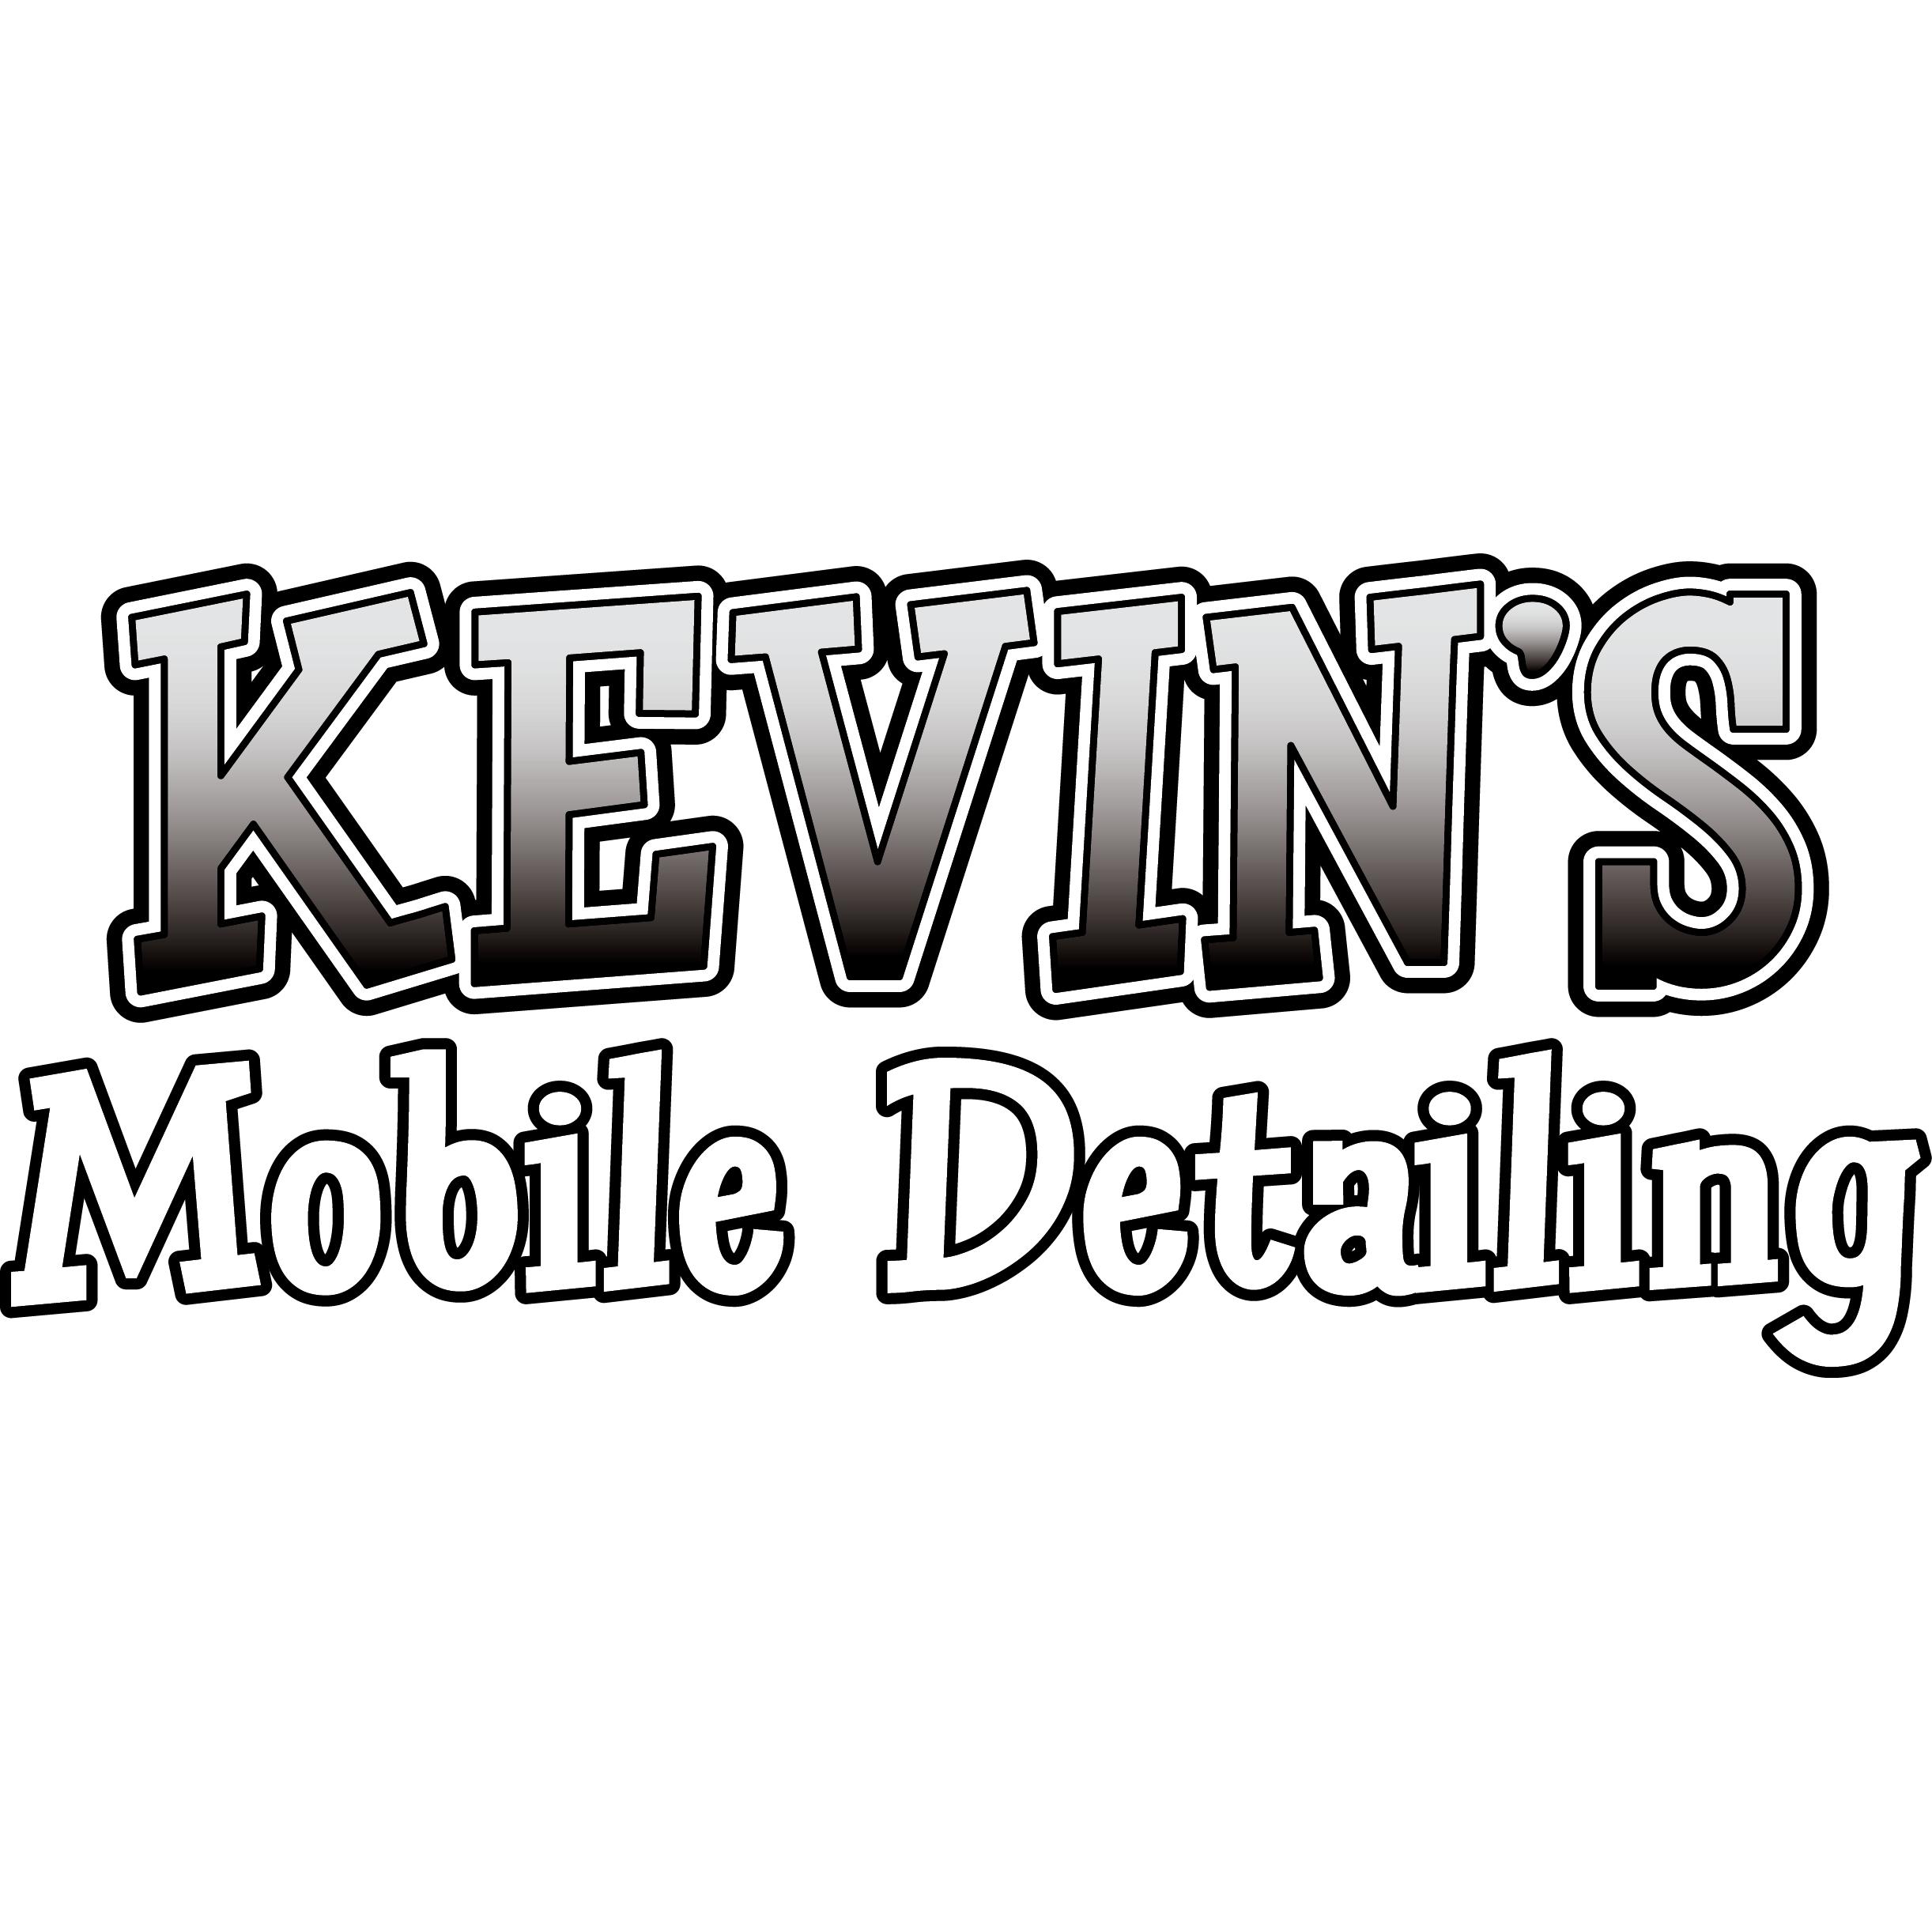 Kevin's Mobile Detailing